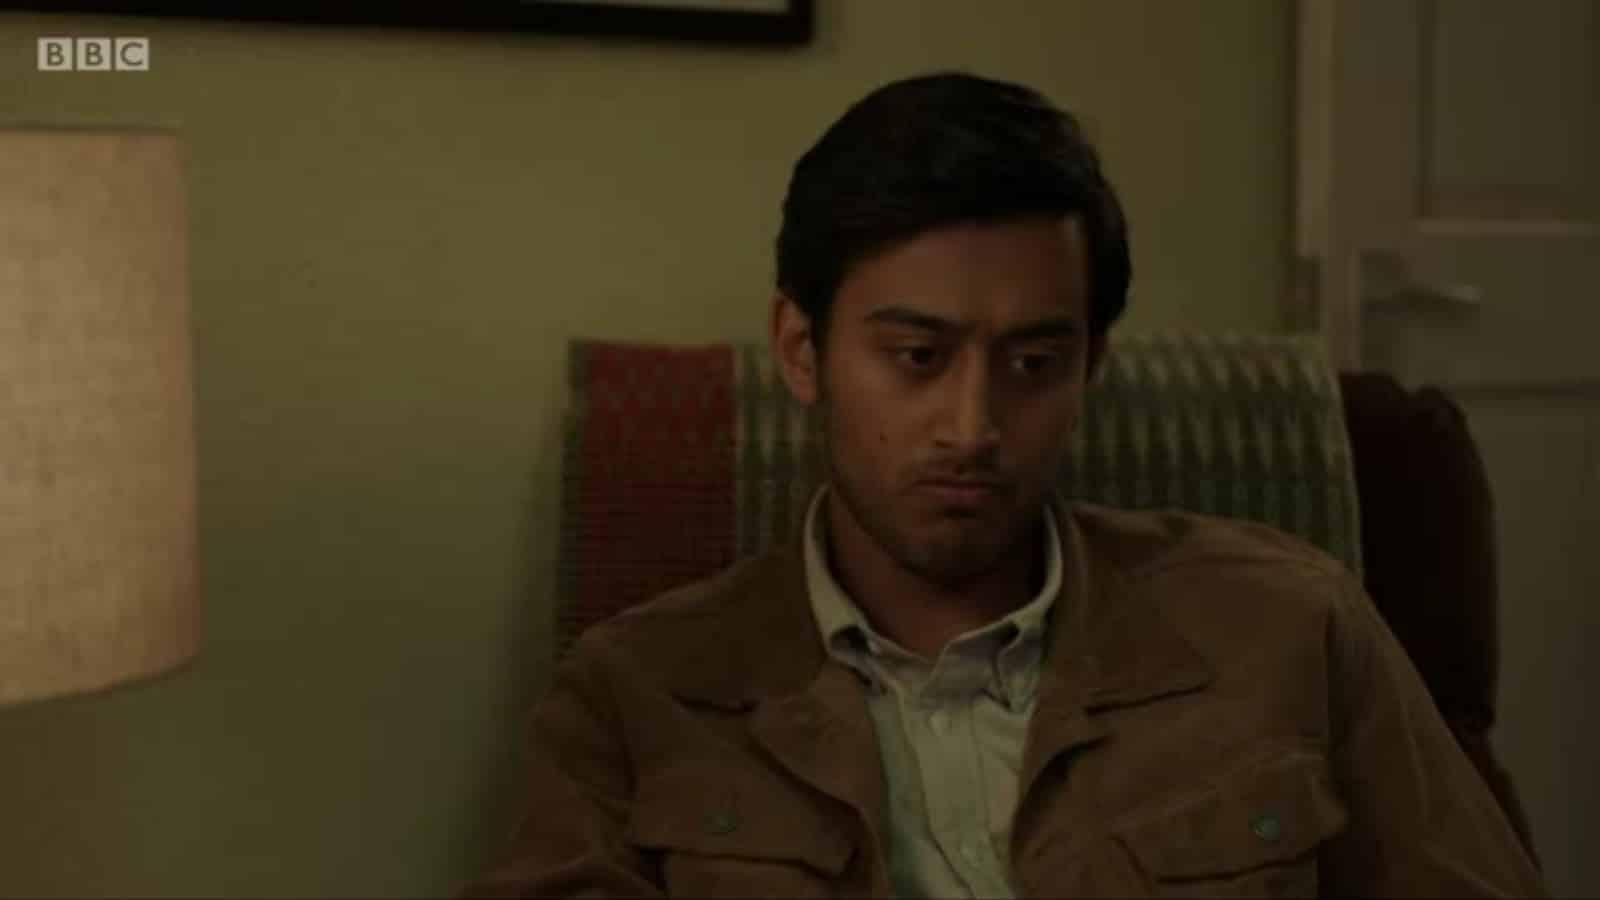 Zain (Karan Gill) sitting, and contemplating something.